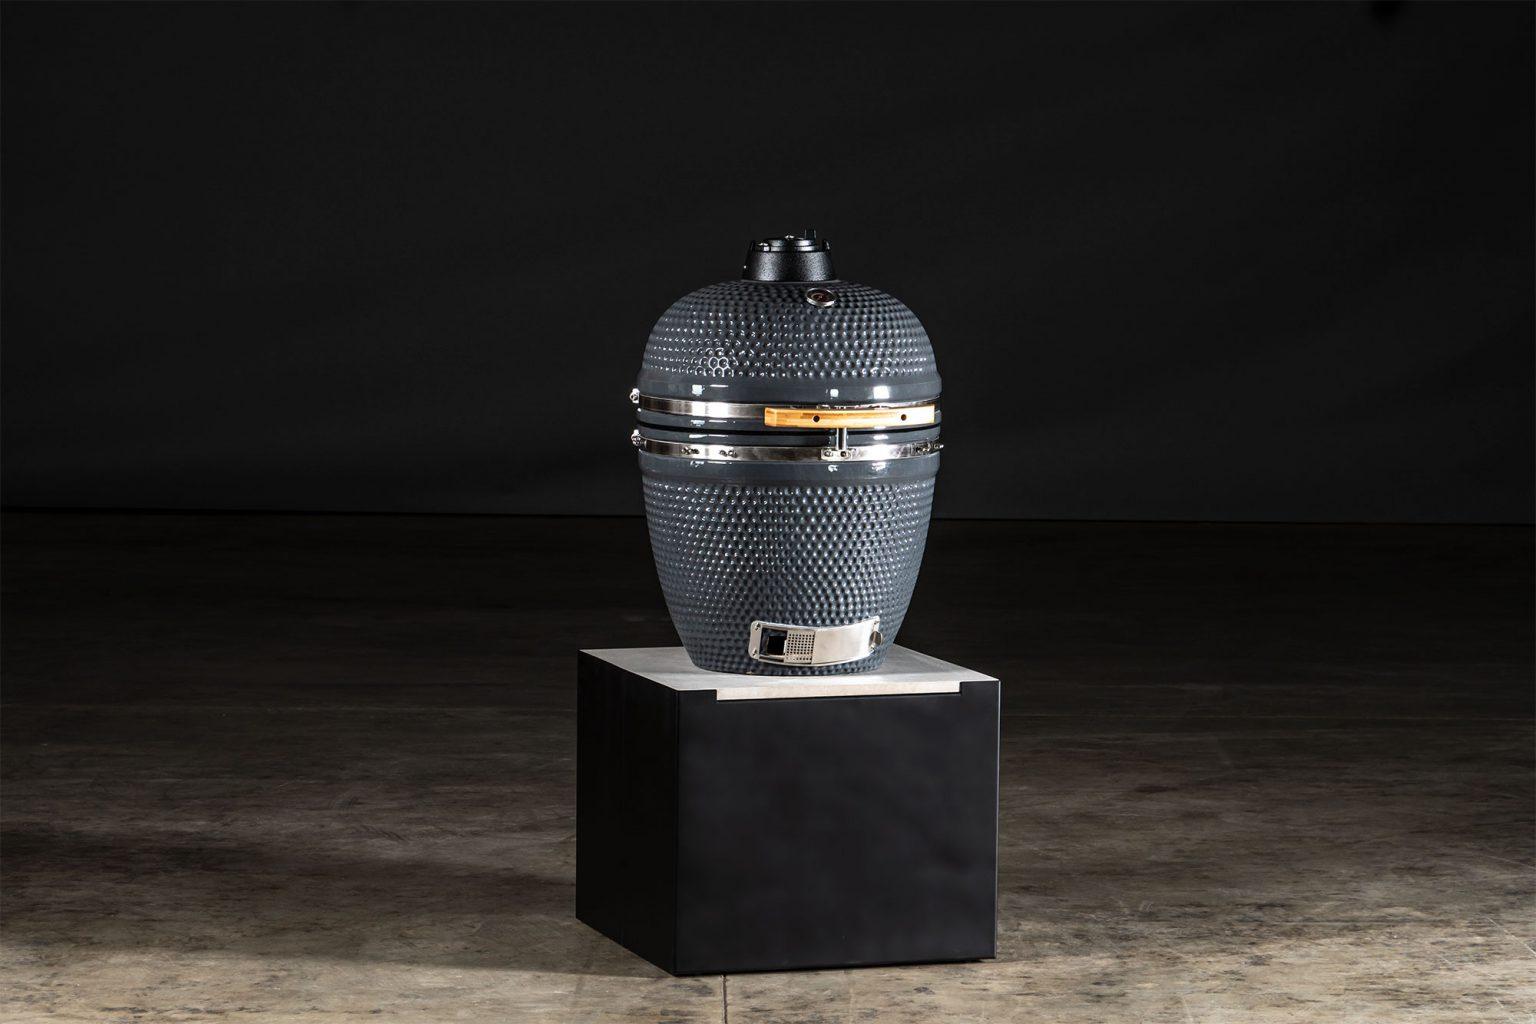 Charcoal BBQ | £360.00 – £1,500.00